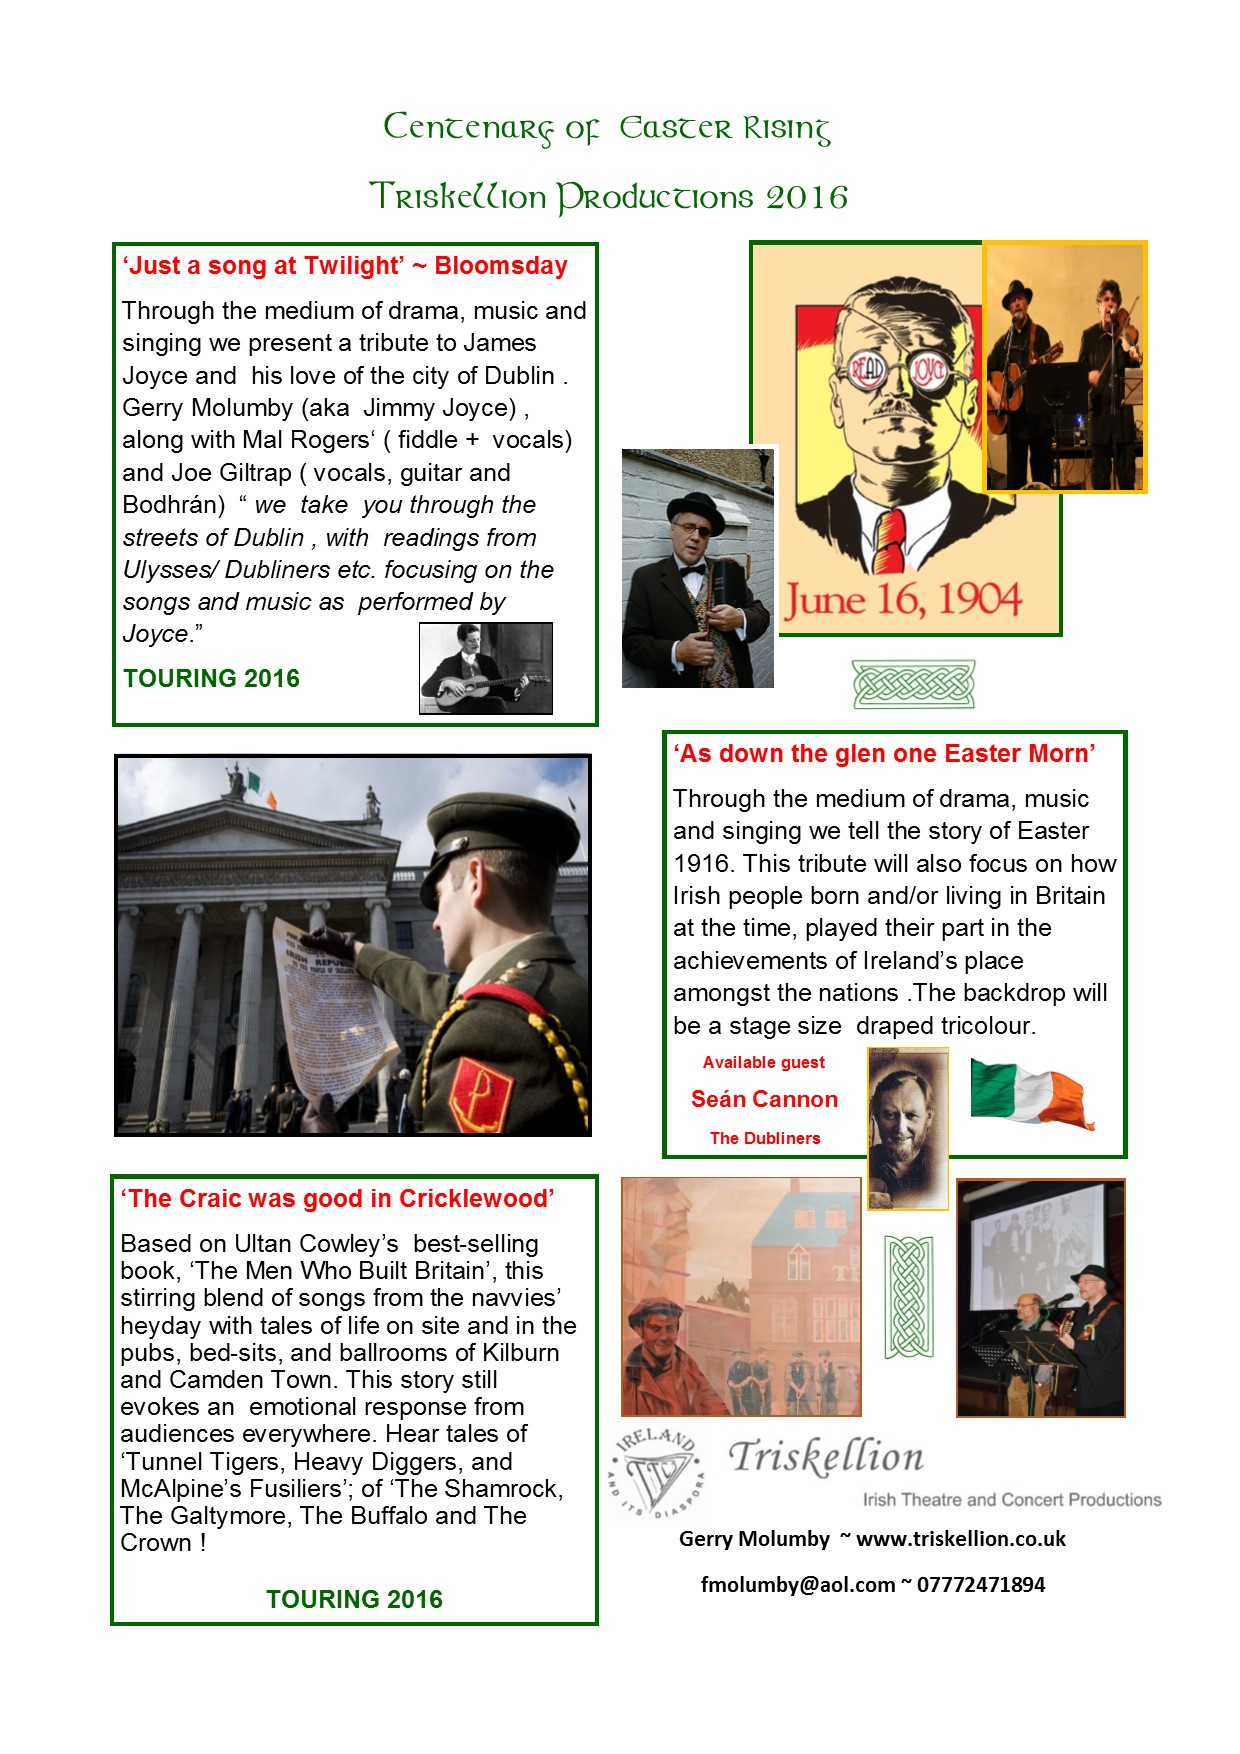 1916 Centenary Cultural Celebrations .Triskellion . Gerry Molumby.